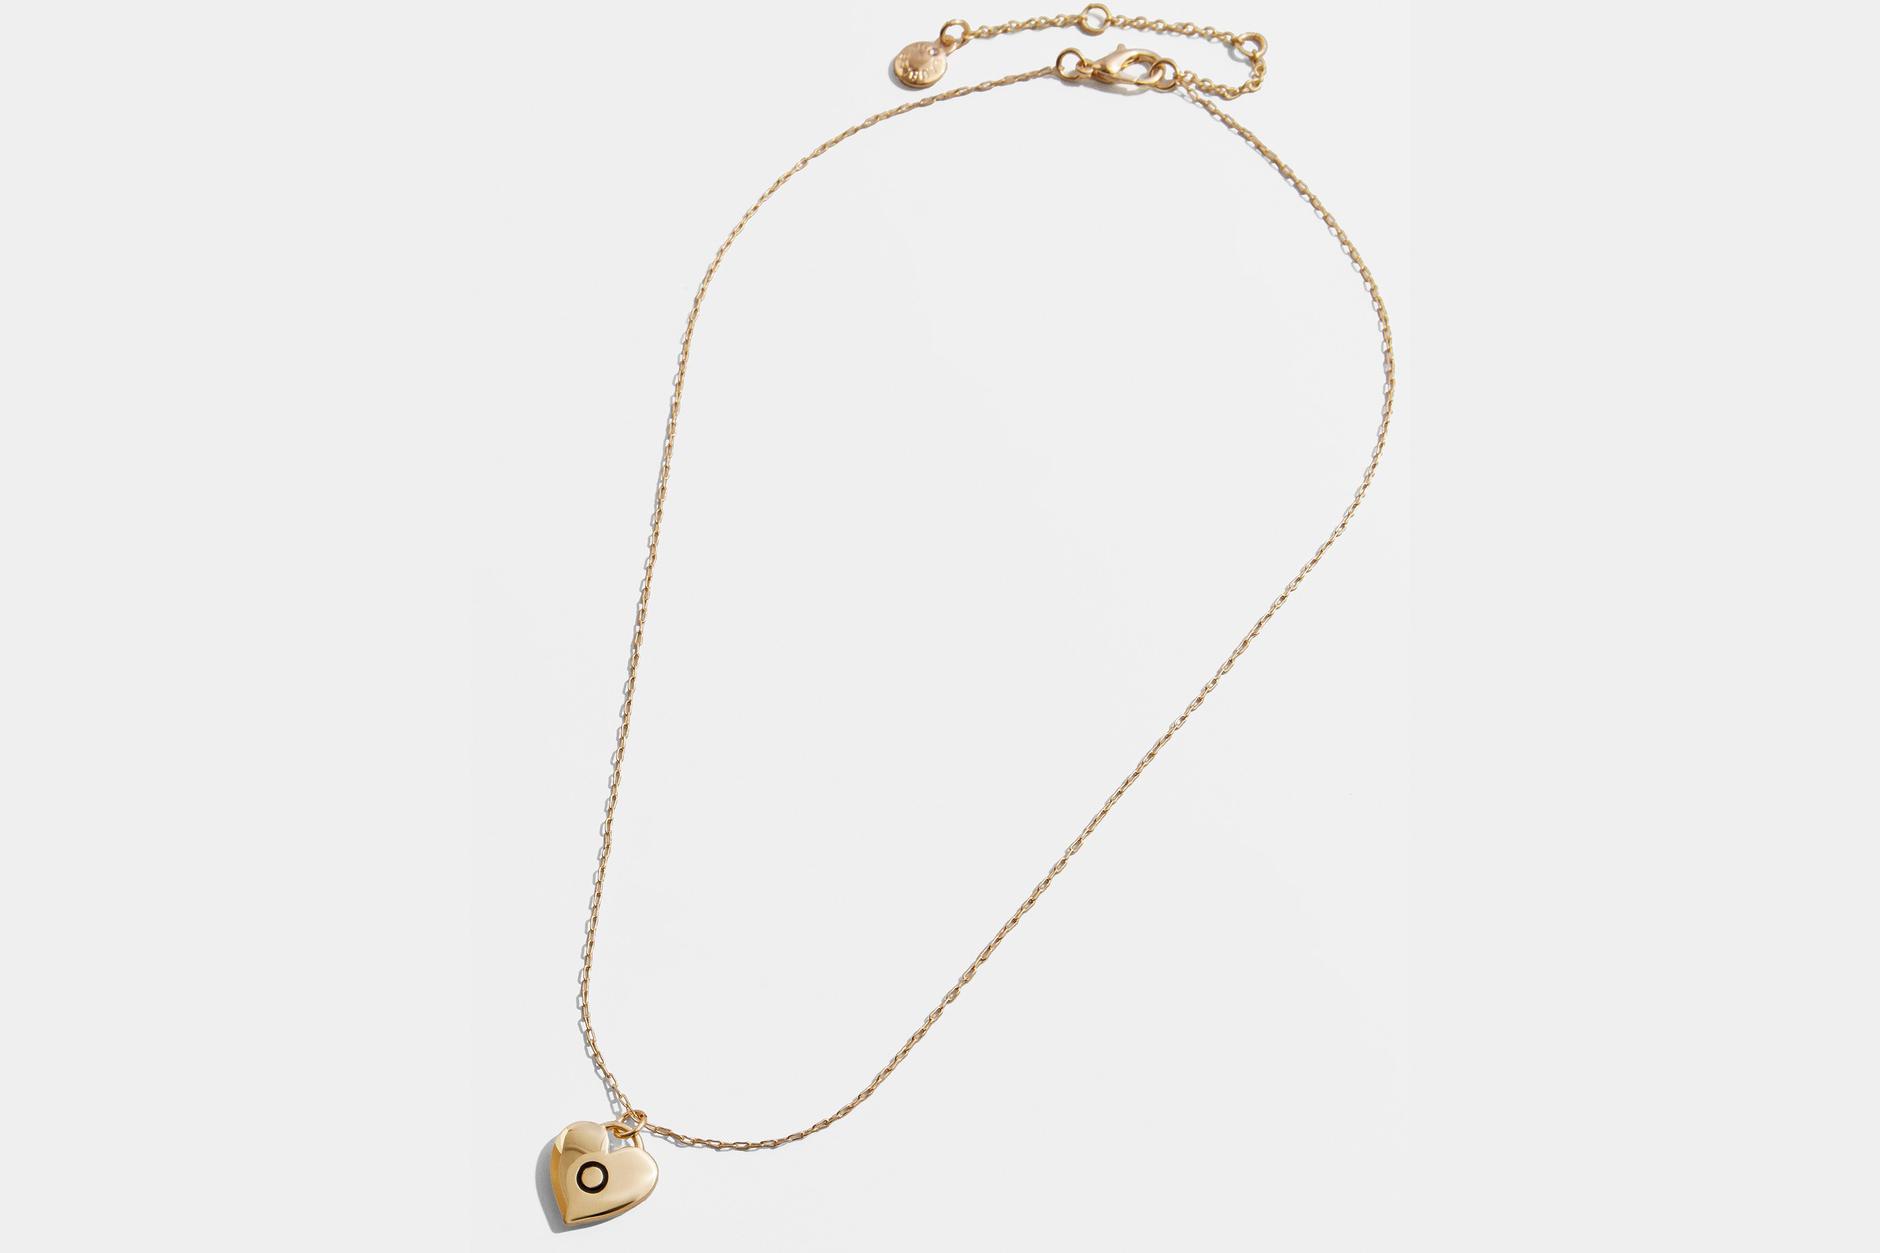 baublebar-sale-necklace.jpg